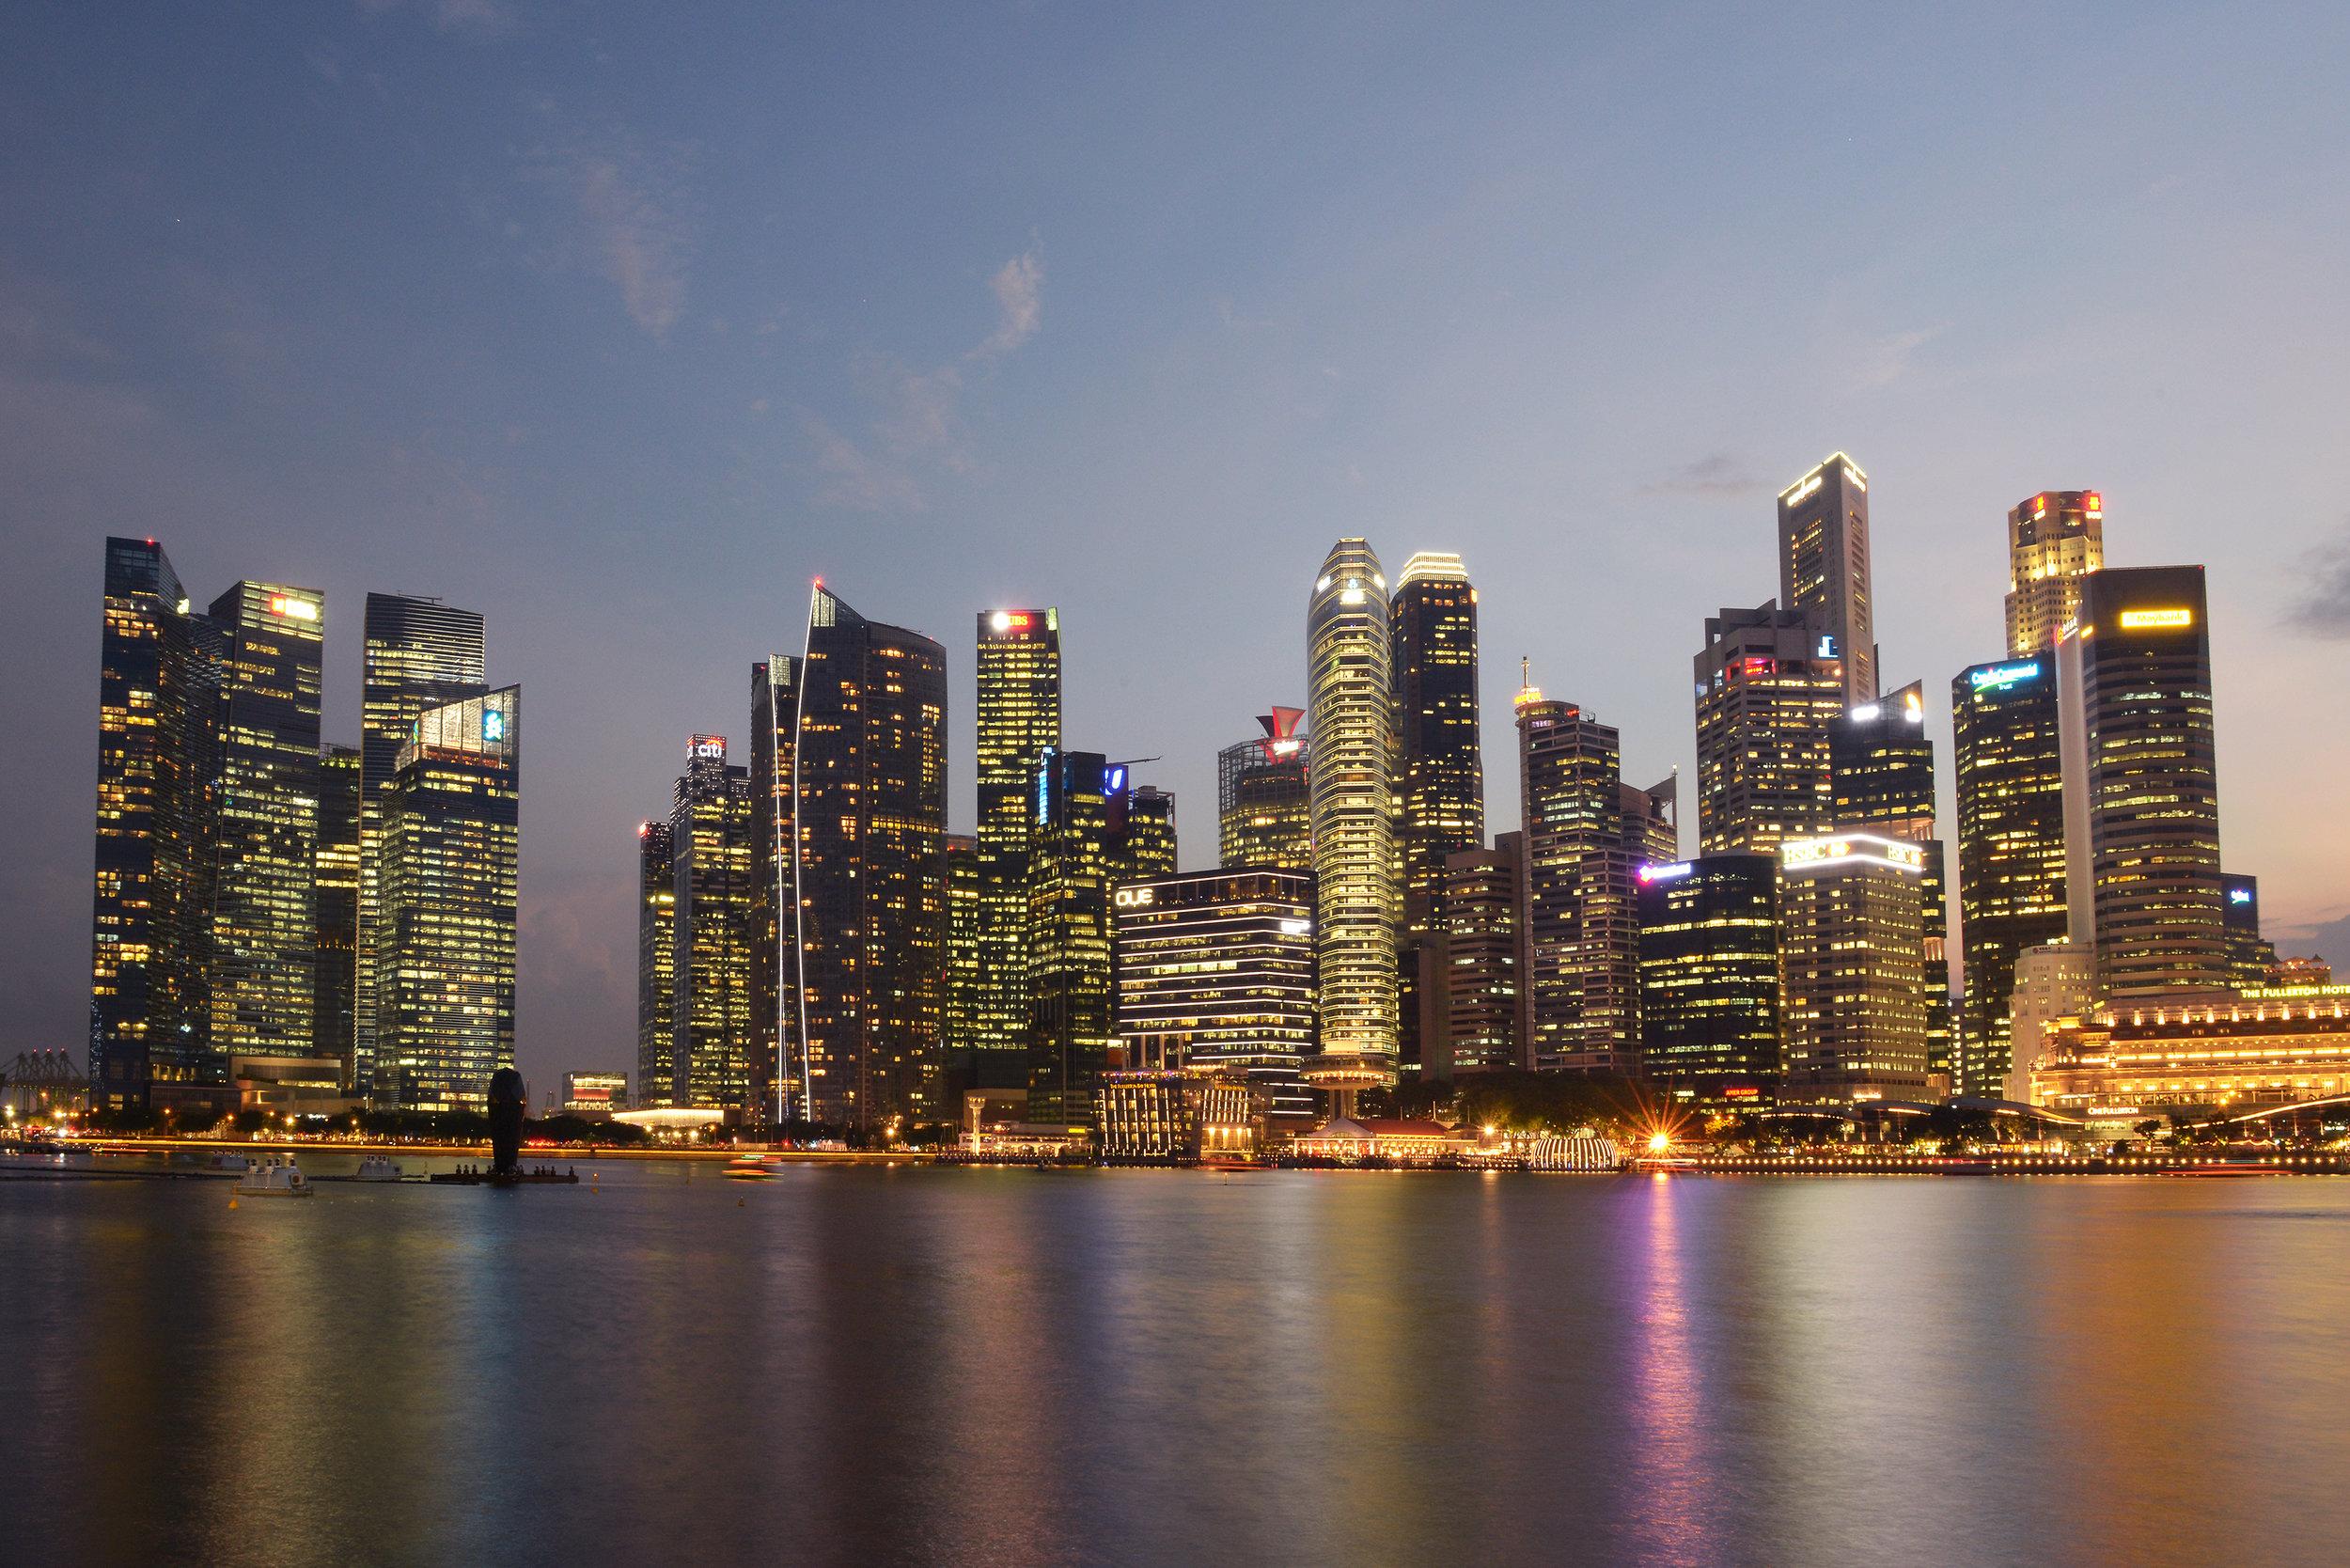 Singapore, bisneskaupunginosa, CBD